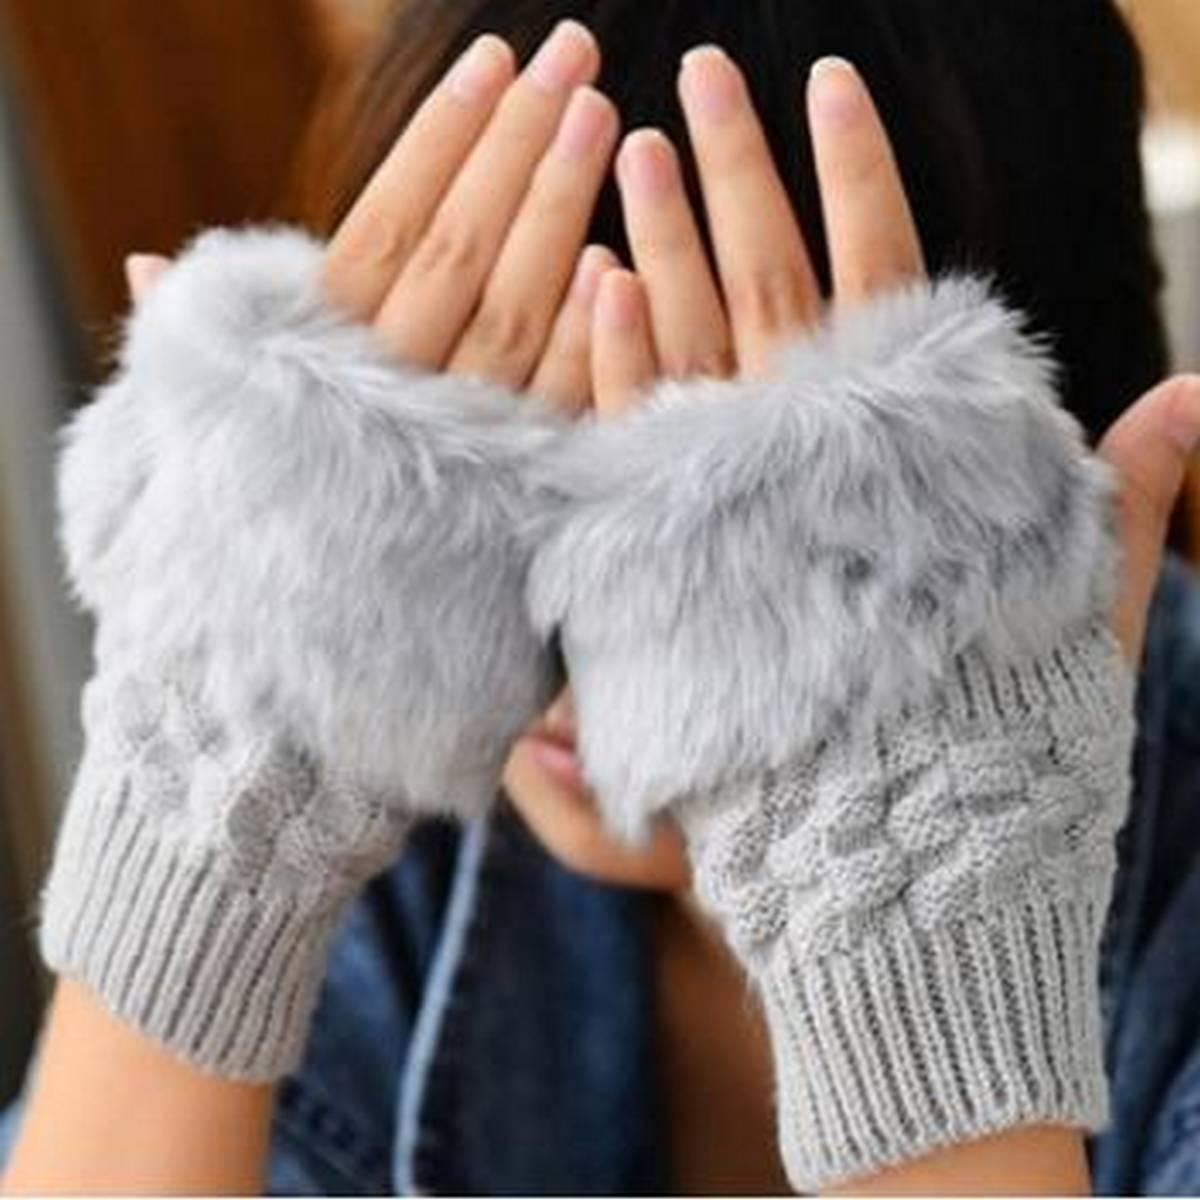 Winter Autumn Warmer Fashion Girls Wrist Gloves Women Knitted Fingerless Finger Glove